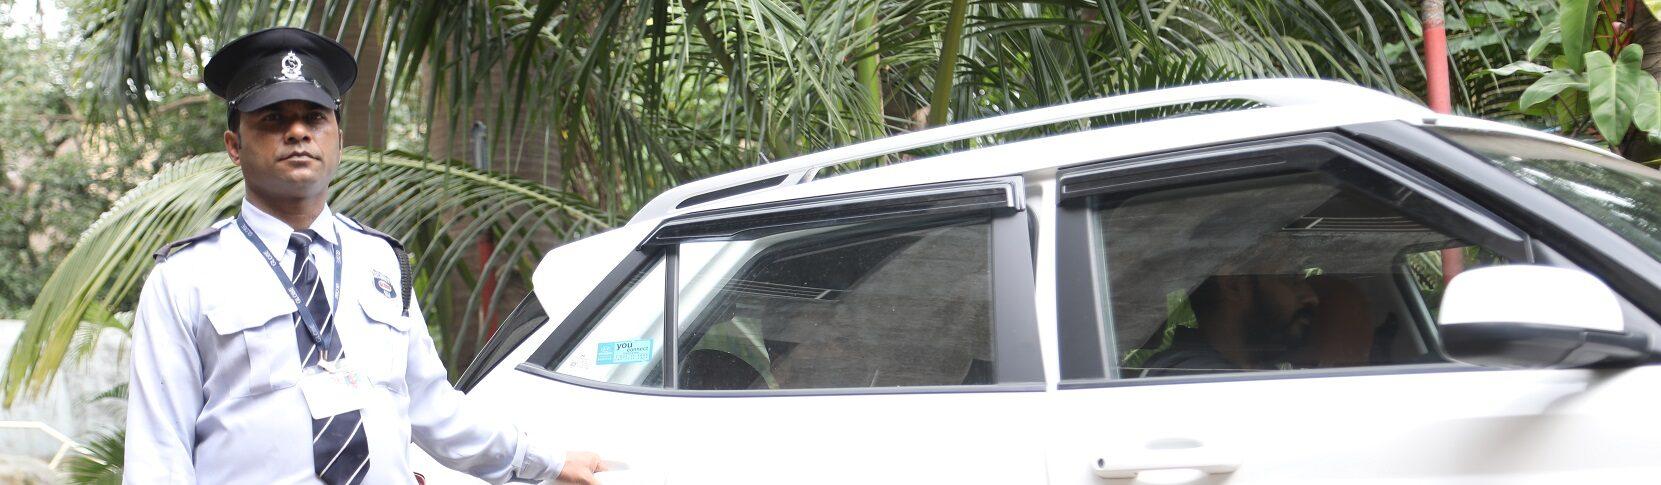 Escort Guard opening the door of car for the employee